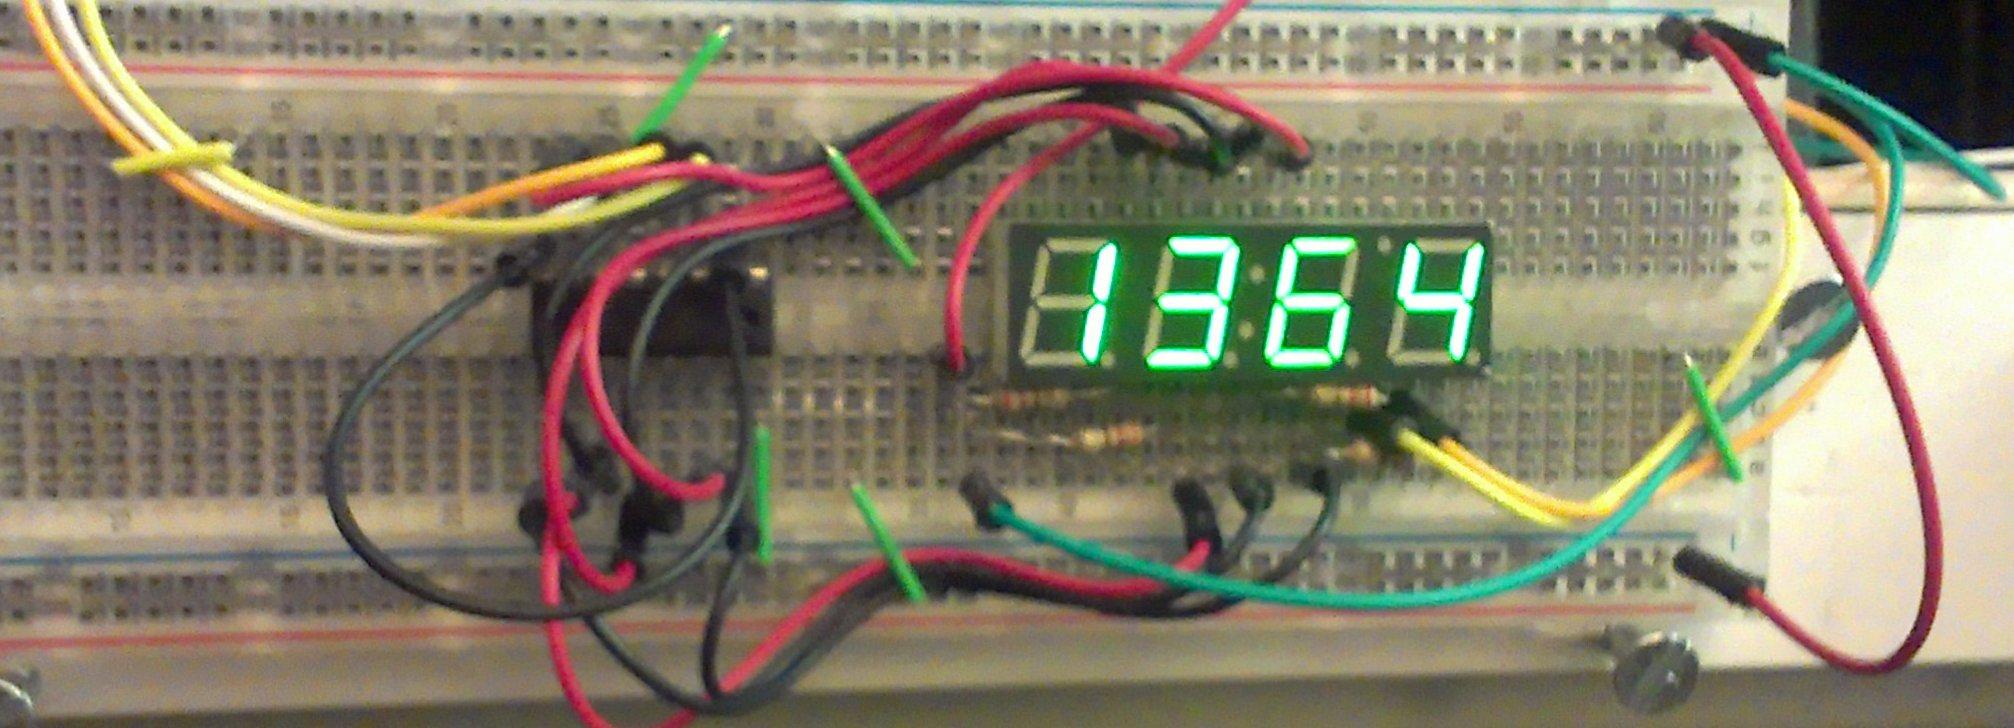 Clock Display Without Serial | Robotic Controls